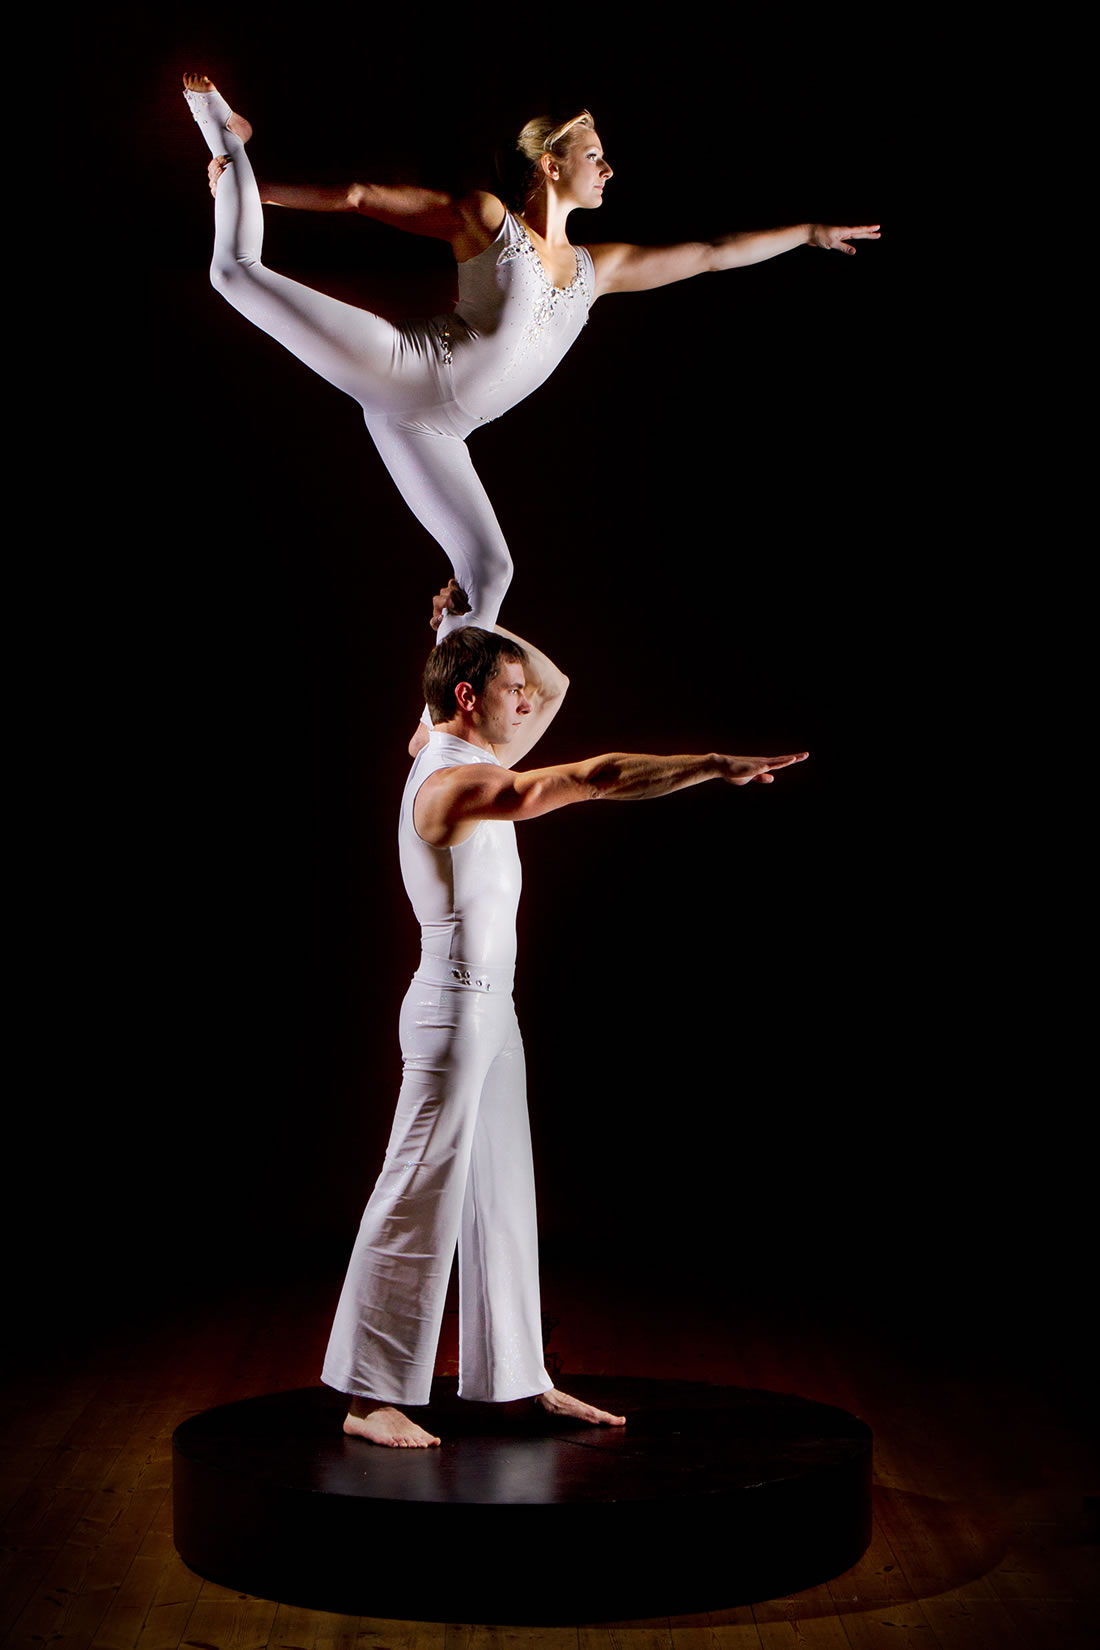 Groundbased Shows - Acrobats Gallery - Revolving podium 2